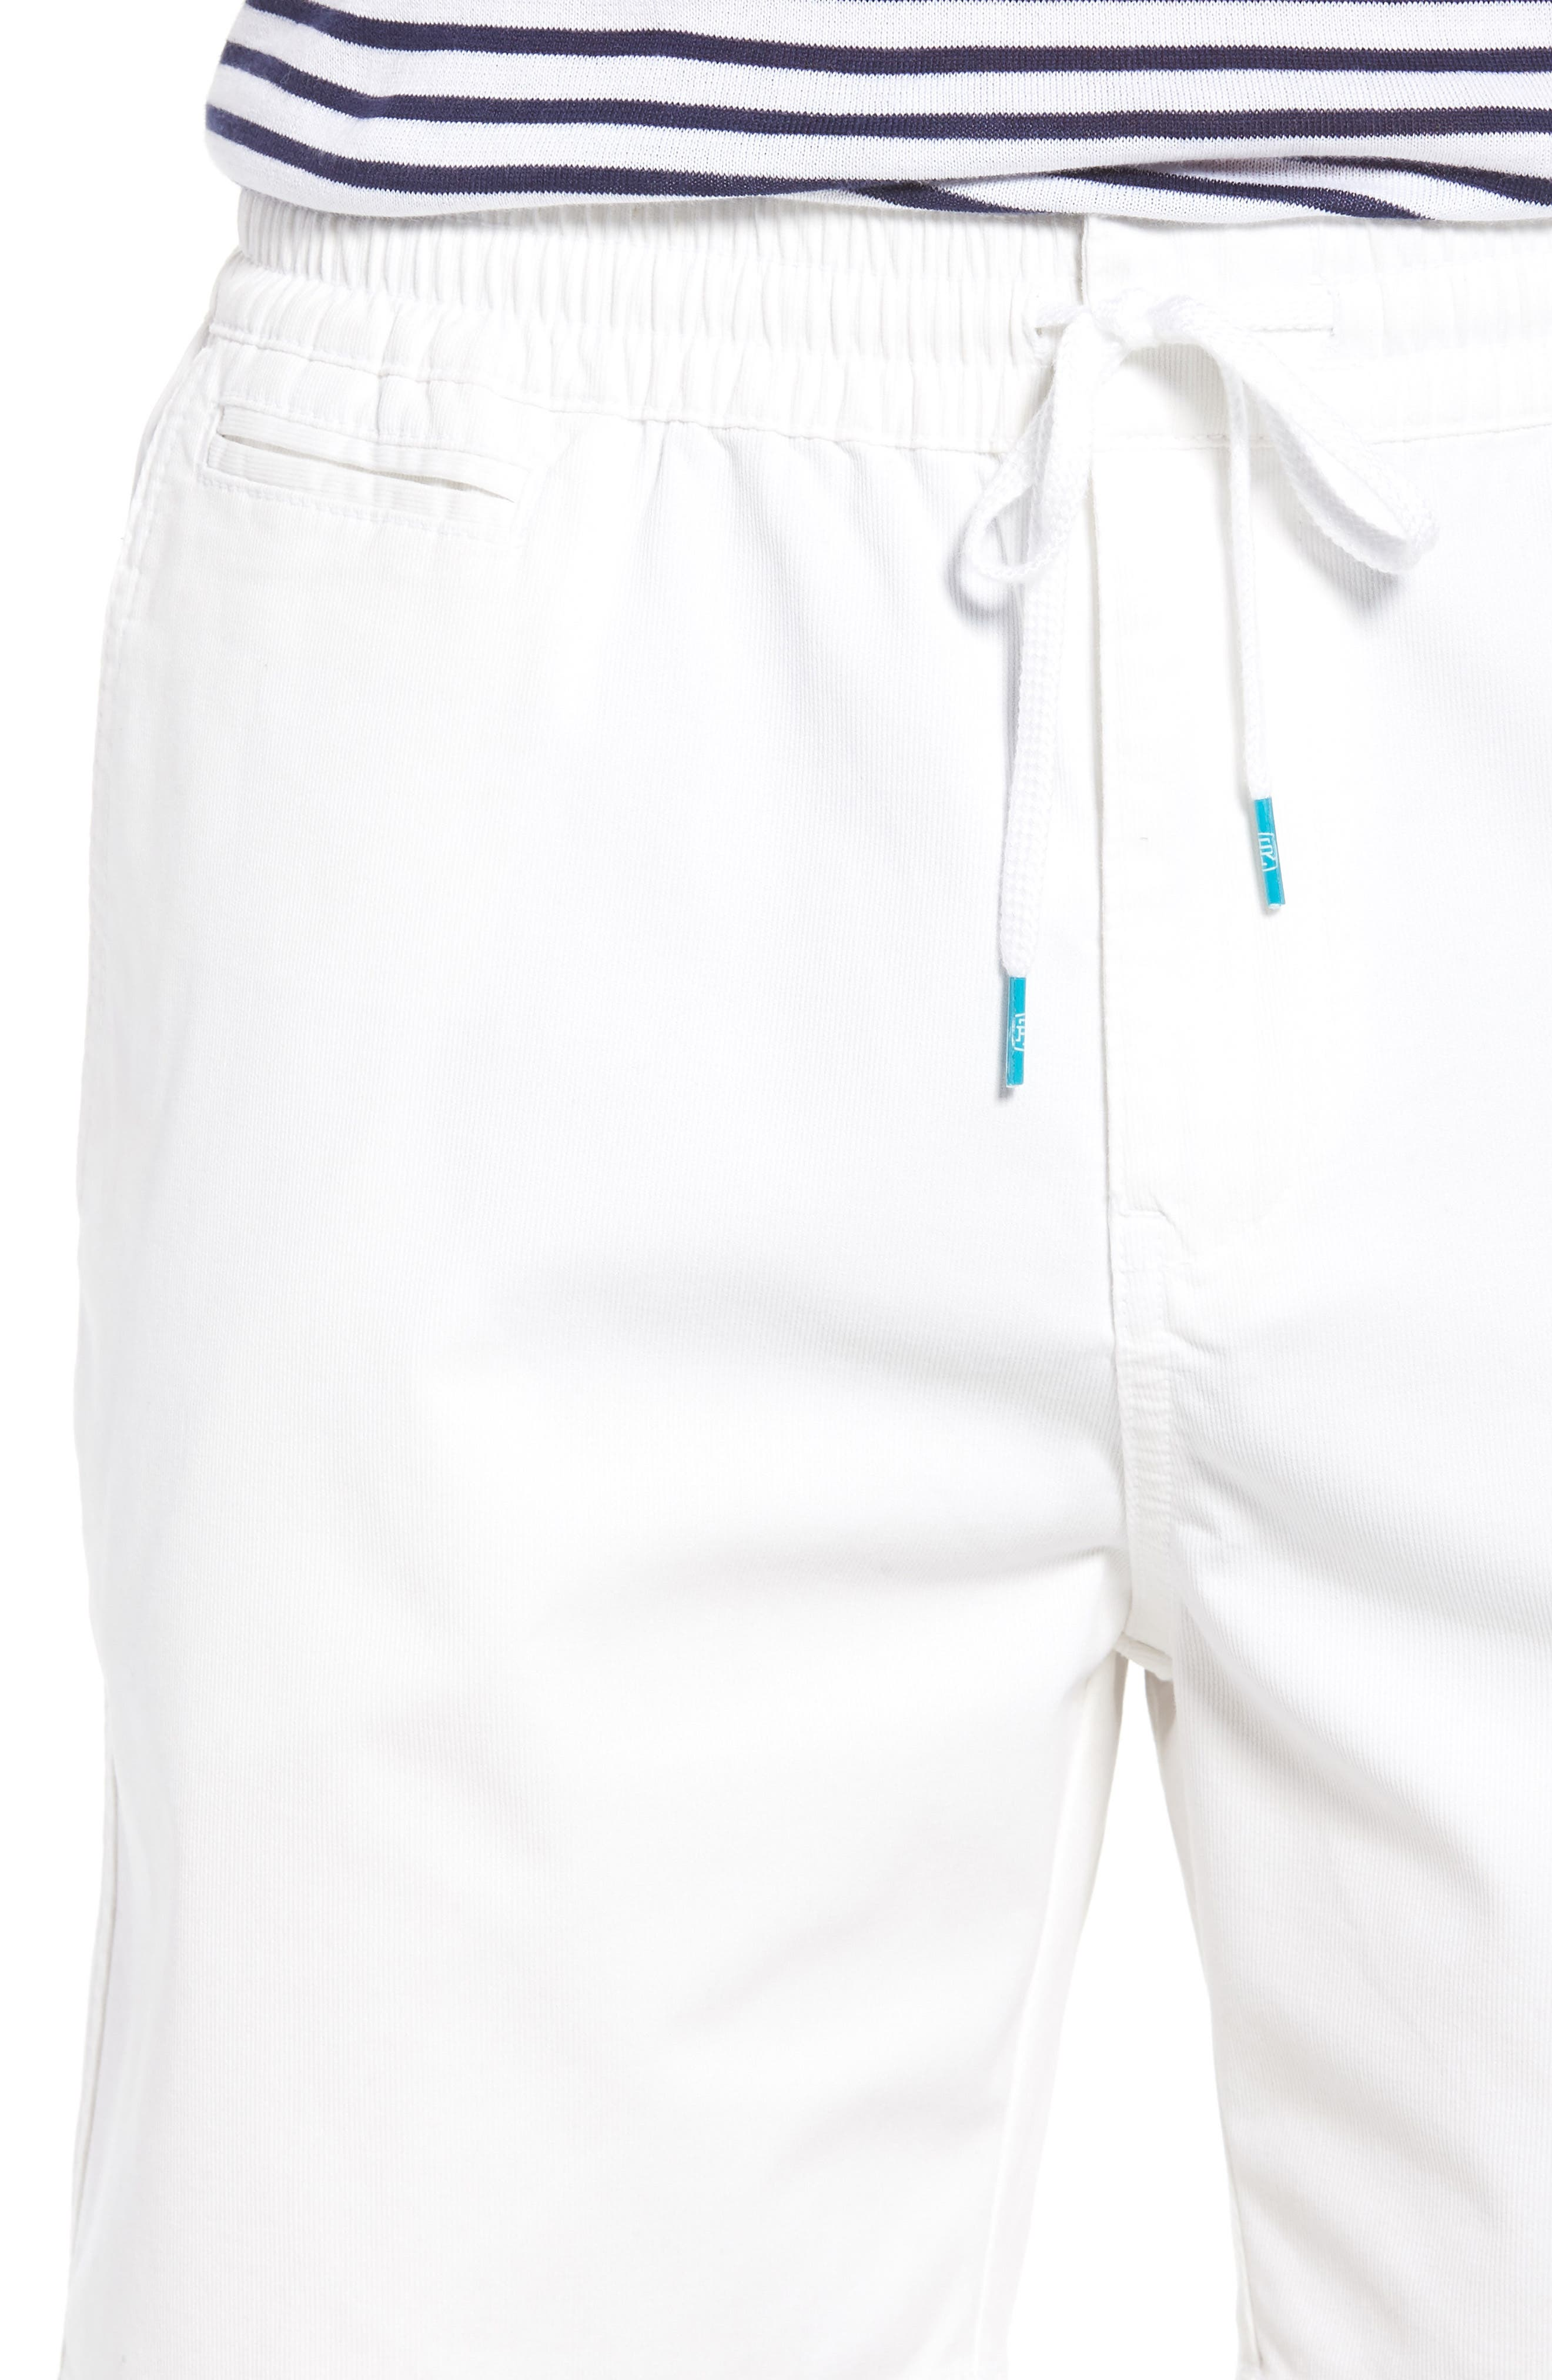 Drawstring Bedford Corduroy Shorts,                             Alternate thumbnail 4, color,                             100